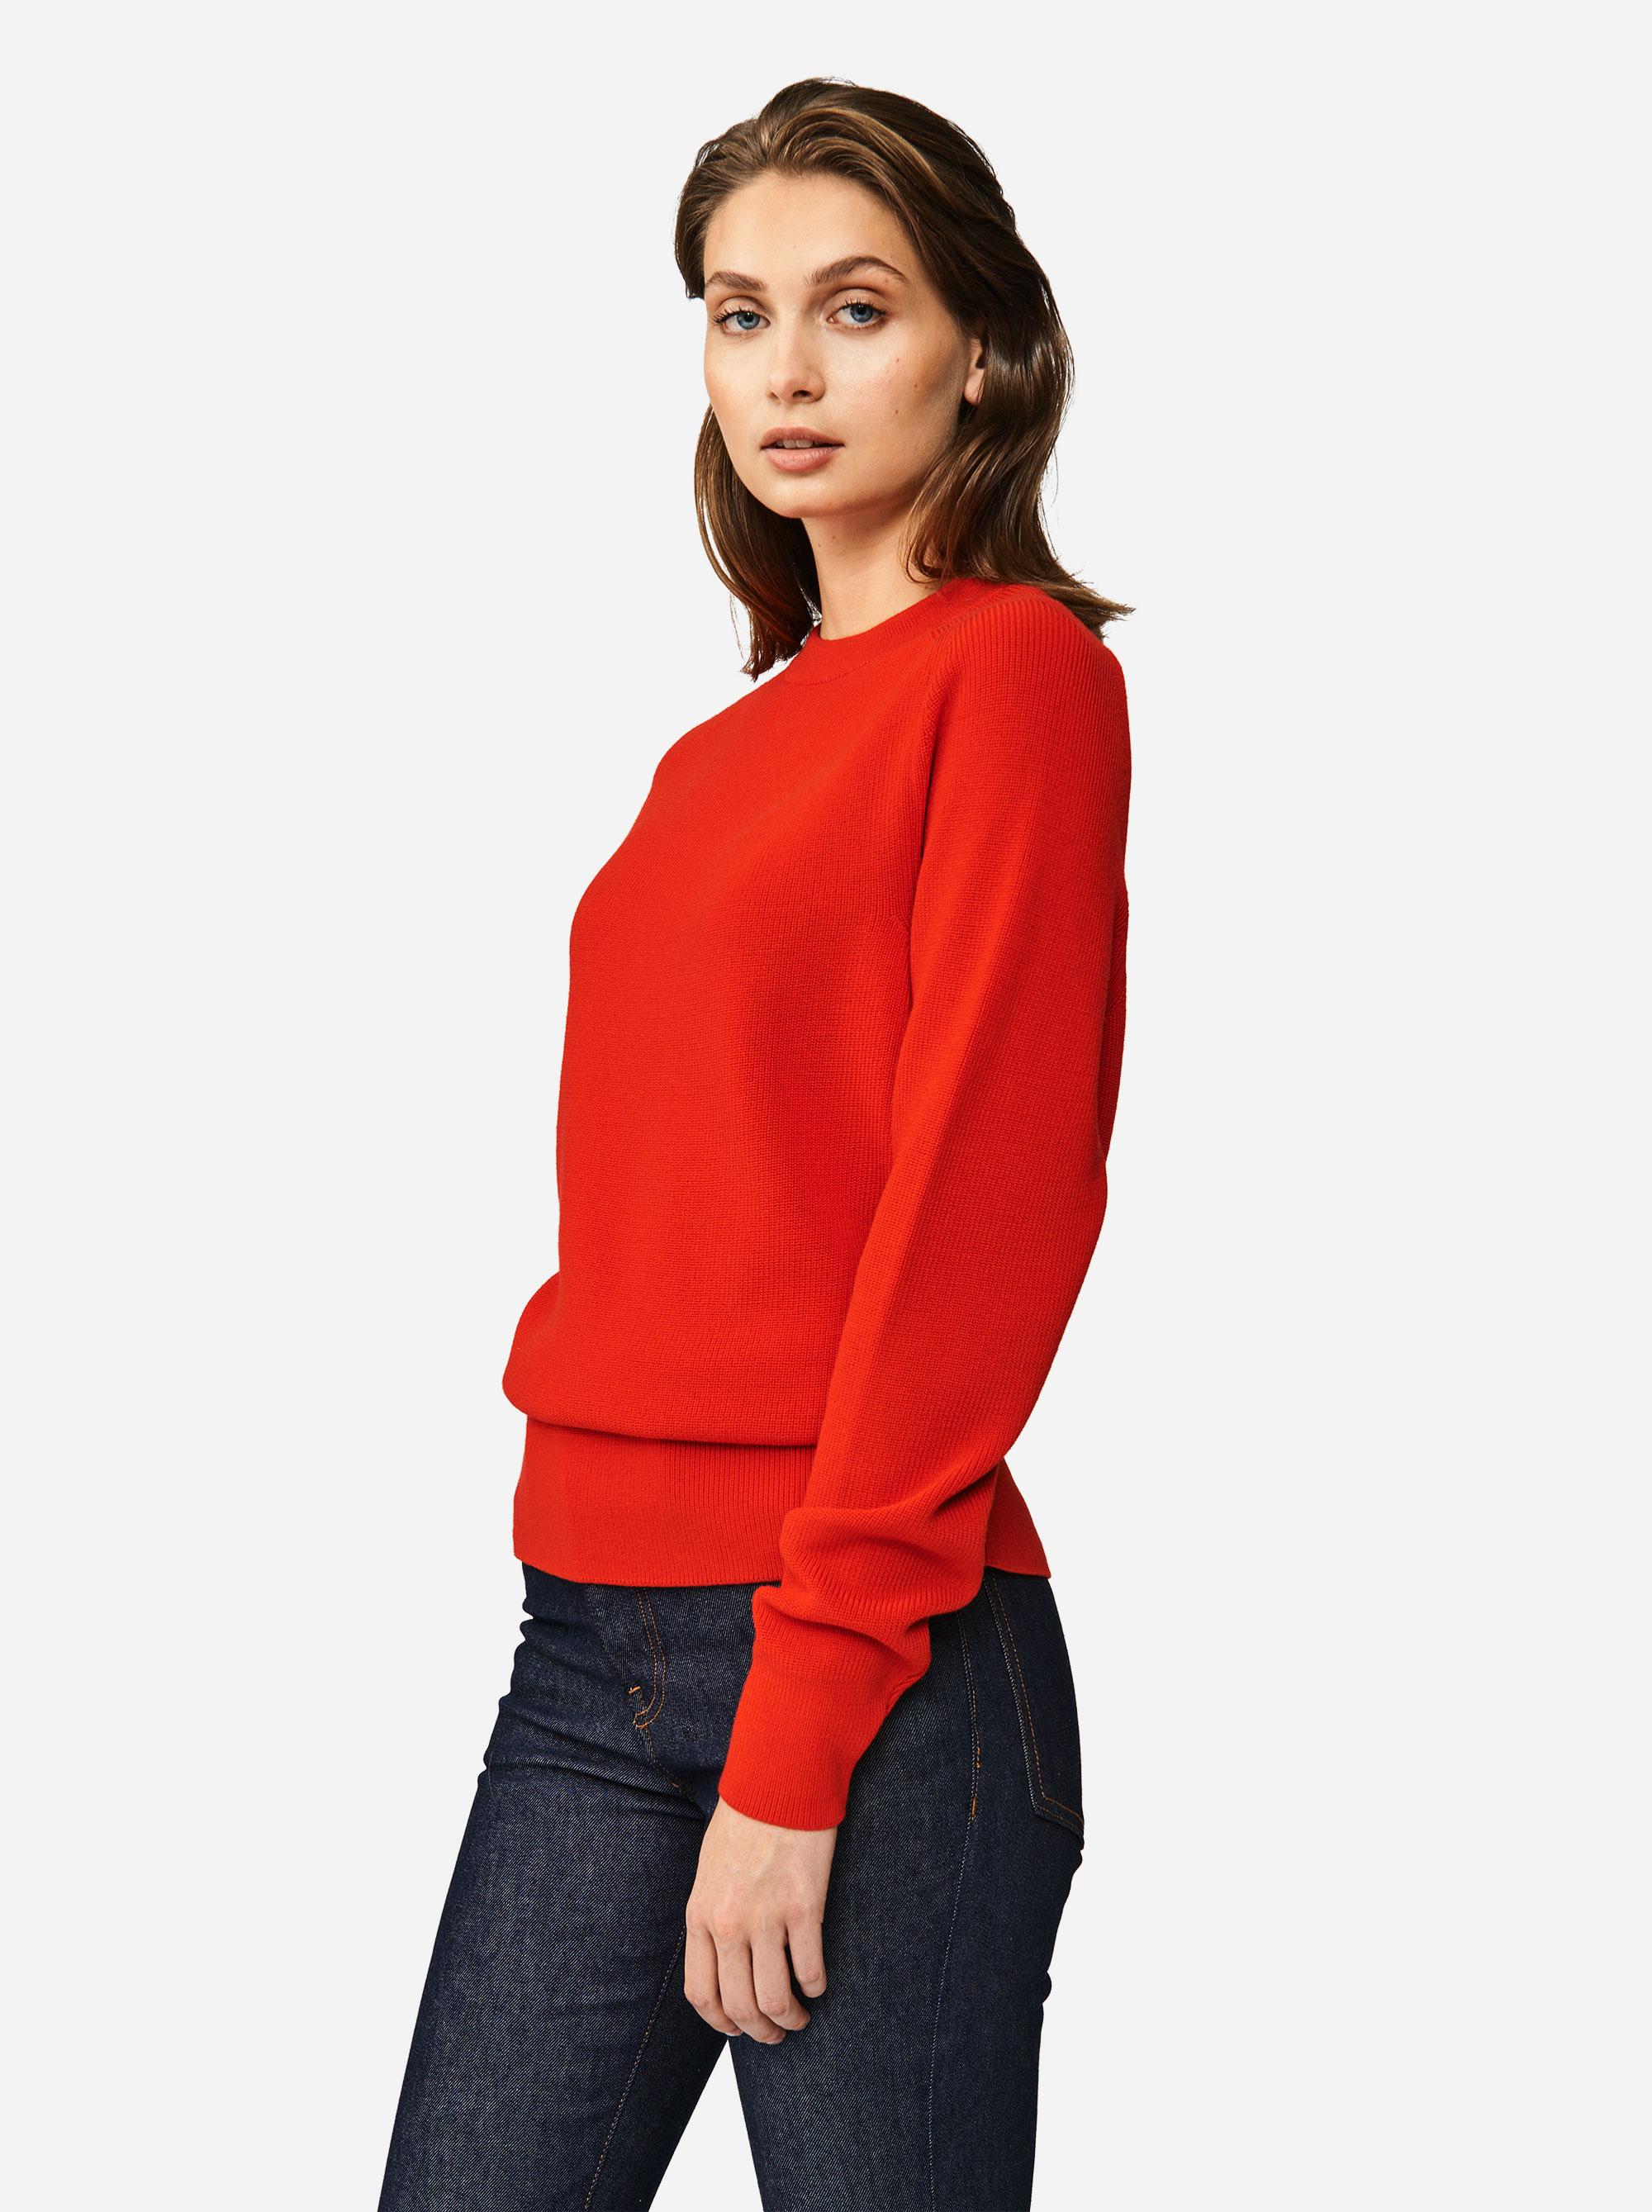 Teym - Crewneck - The Merino Sweater - Women - Red - 1